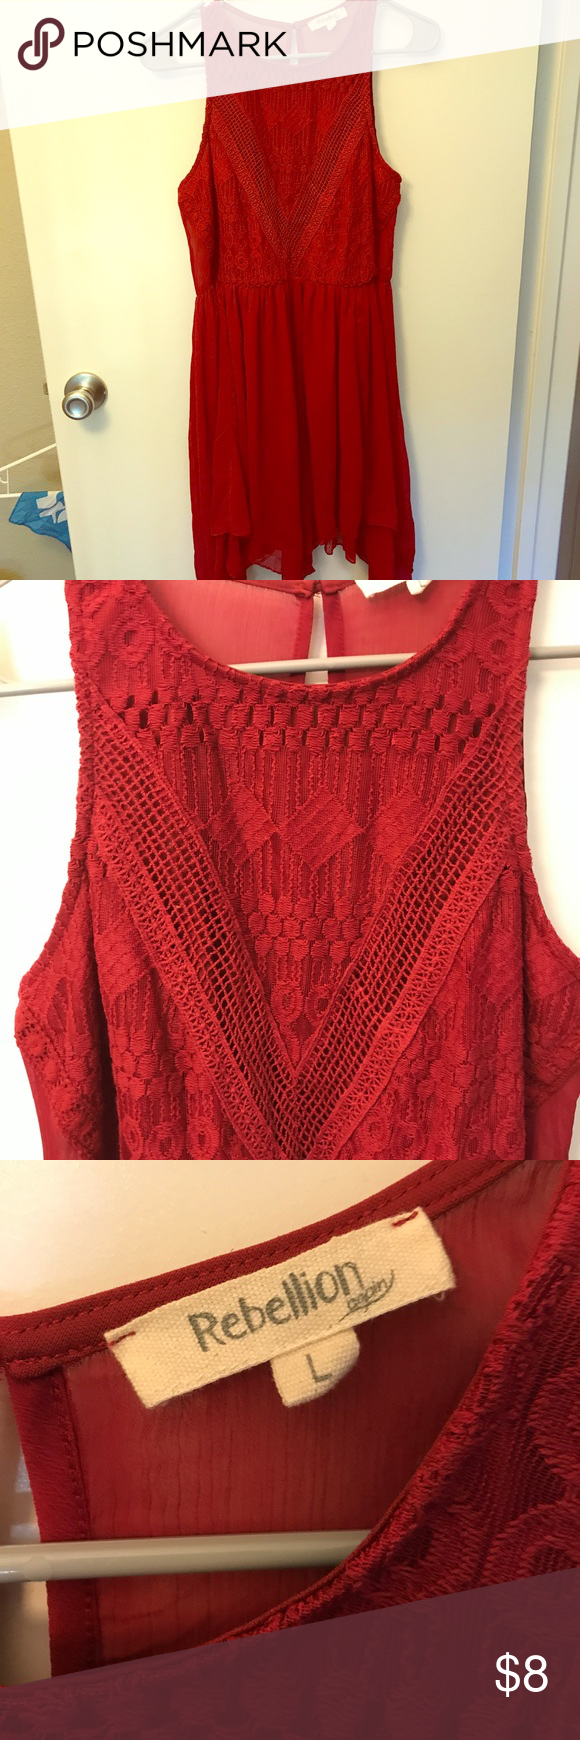 Red long shirtdress sleeveless red sleeveless long shirtdress with